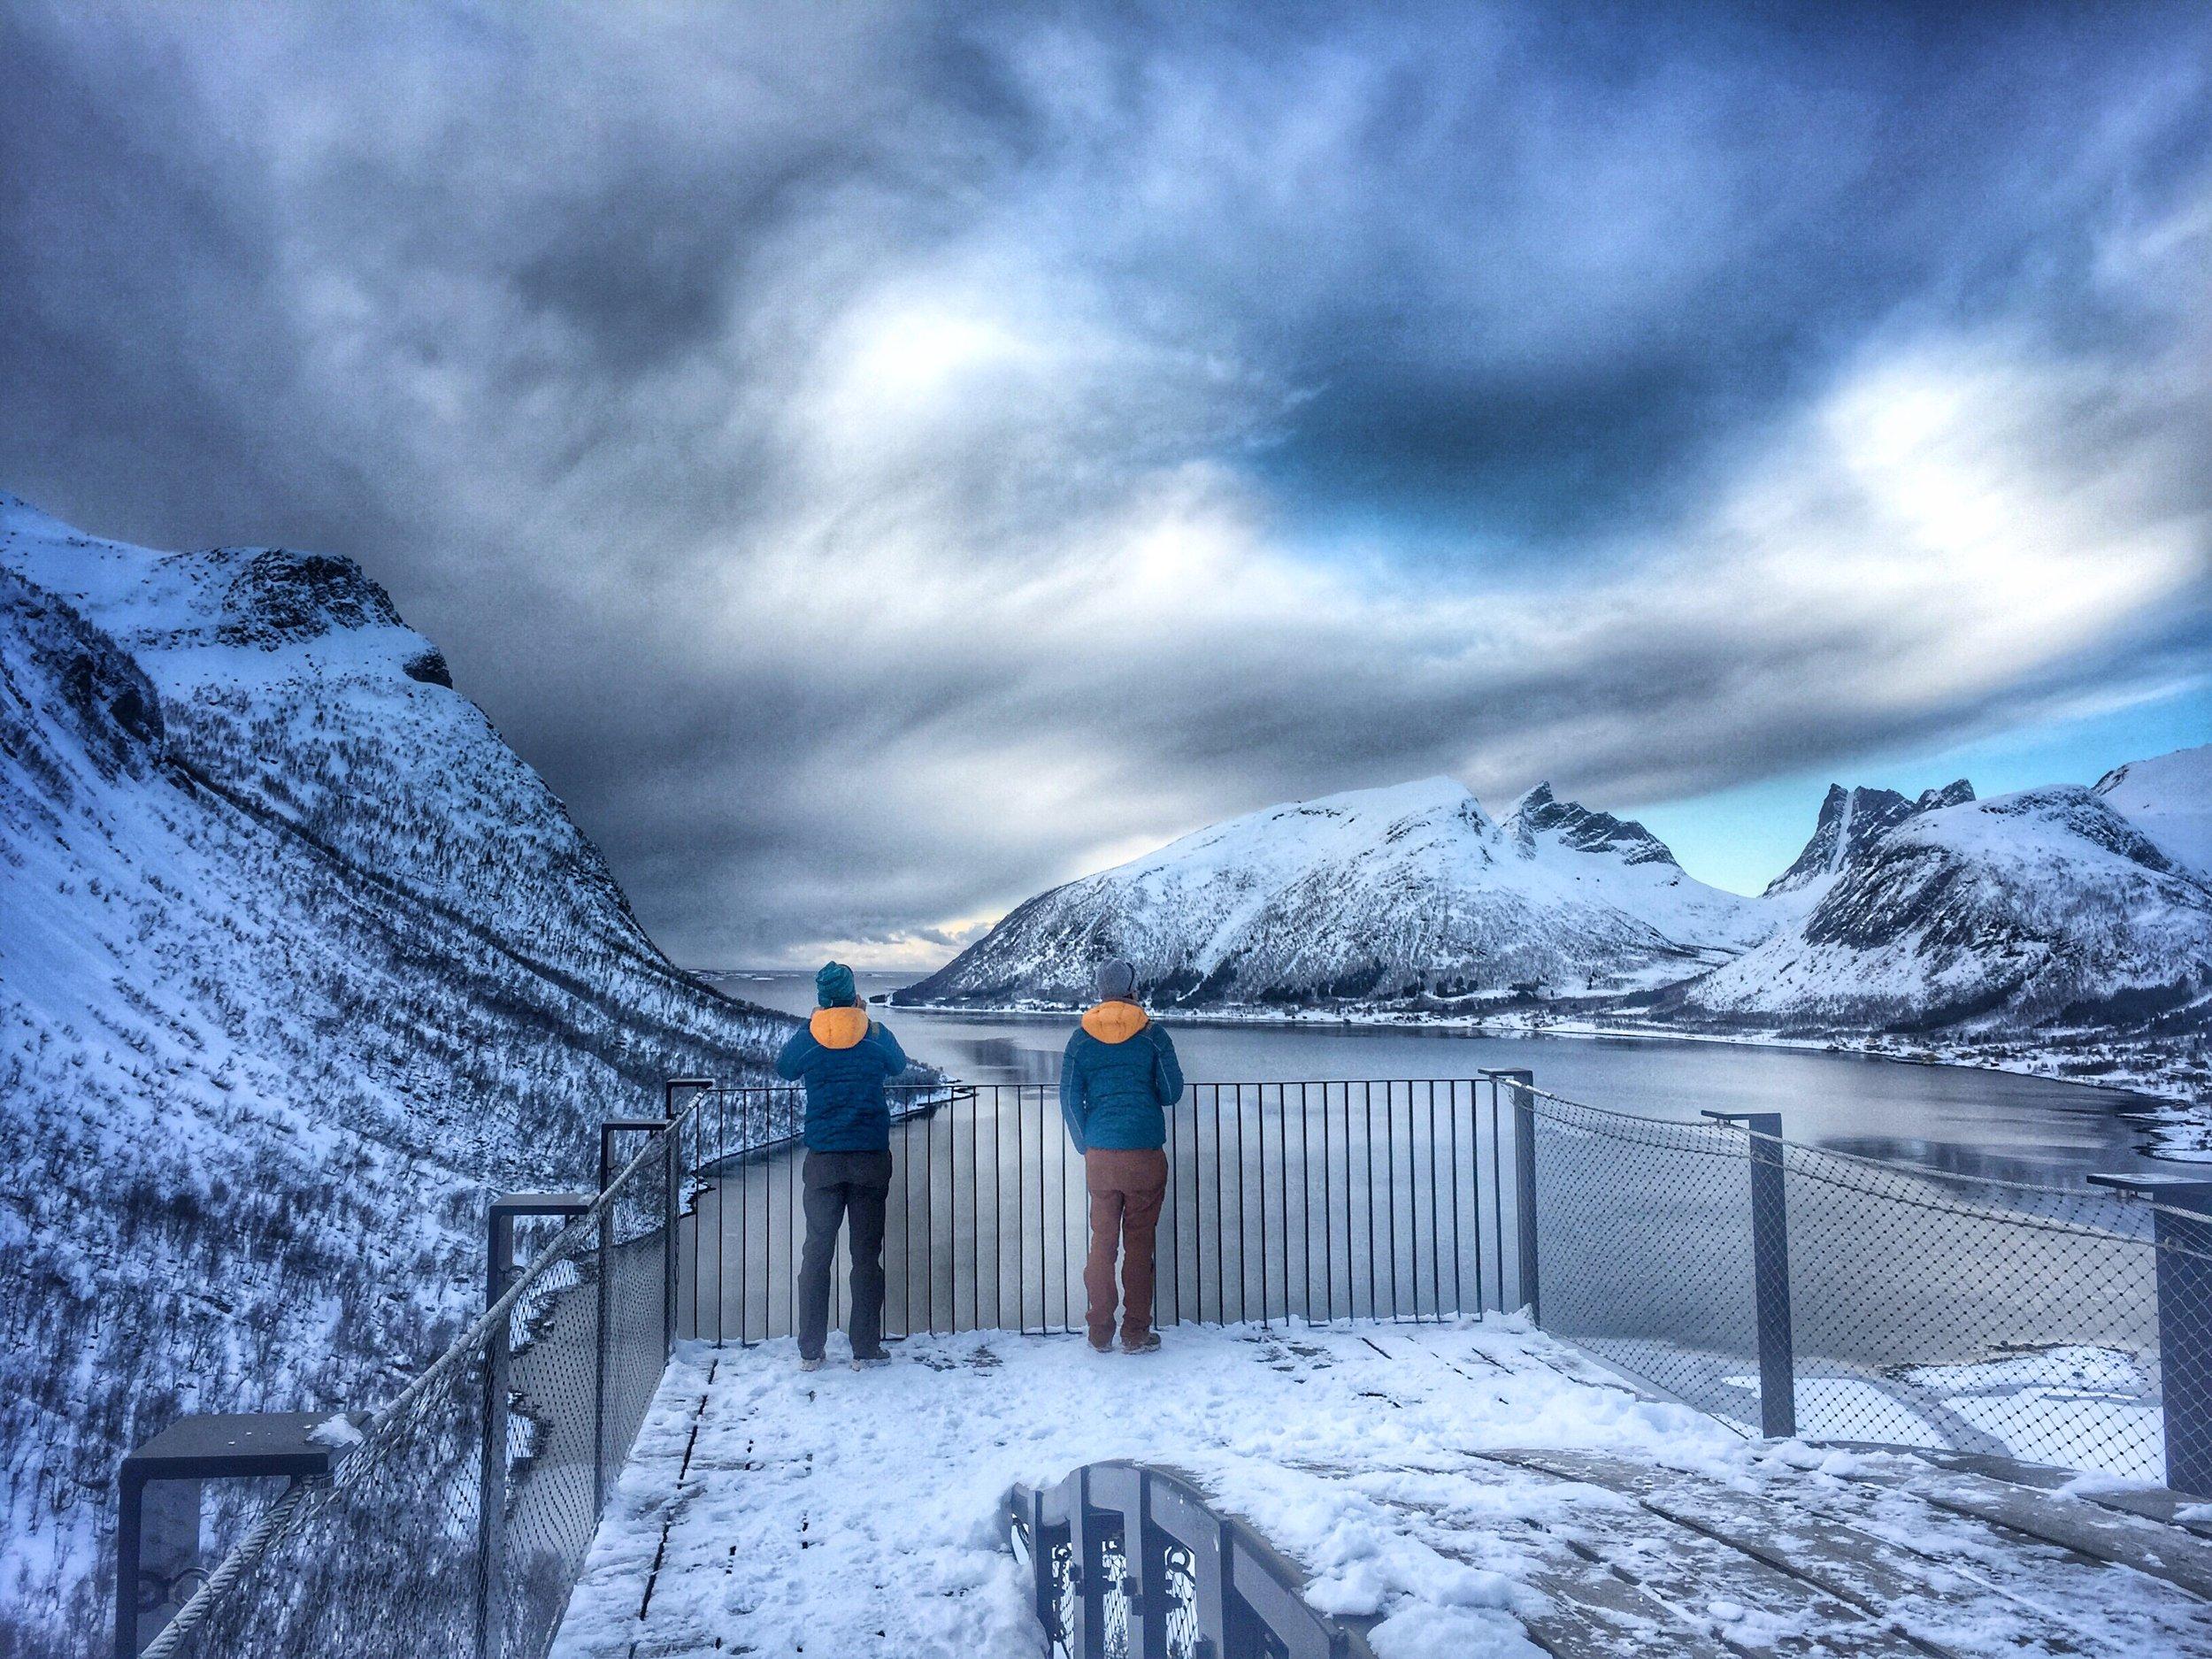 Heike and Tanja Schmitt taking in the view - Bergsbotn, Senja Island - picture Matthias Scherer